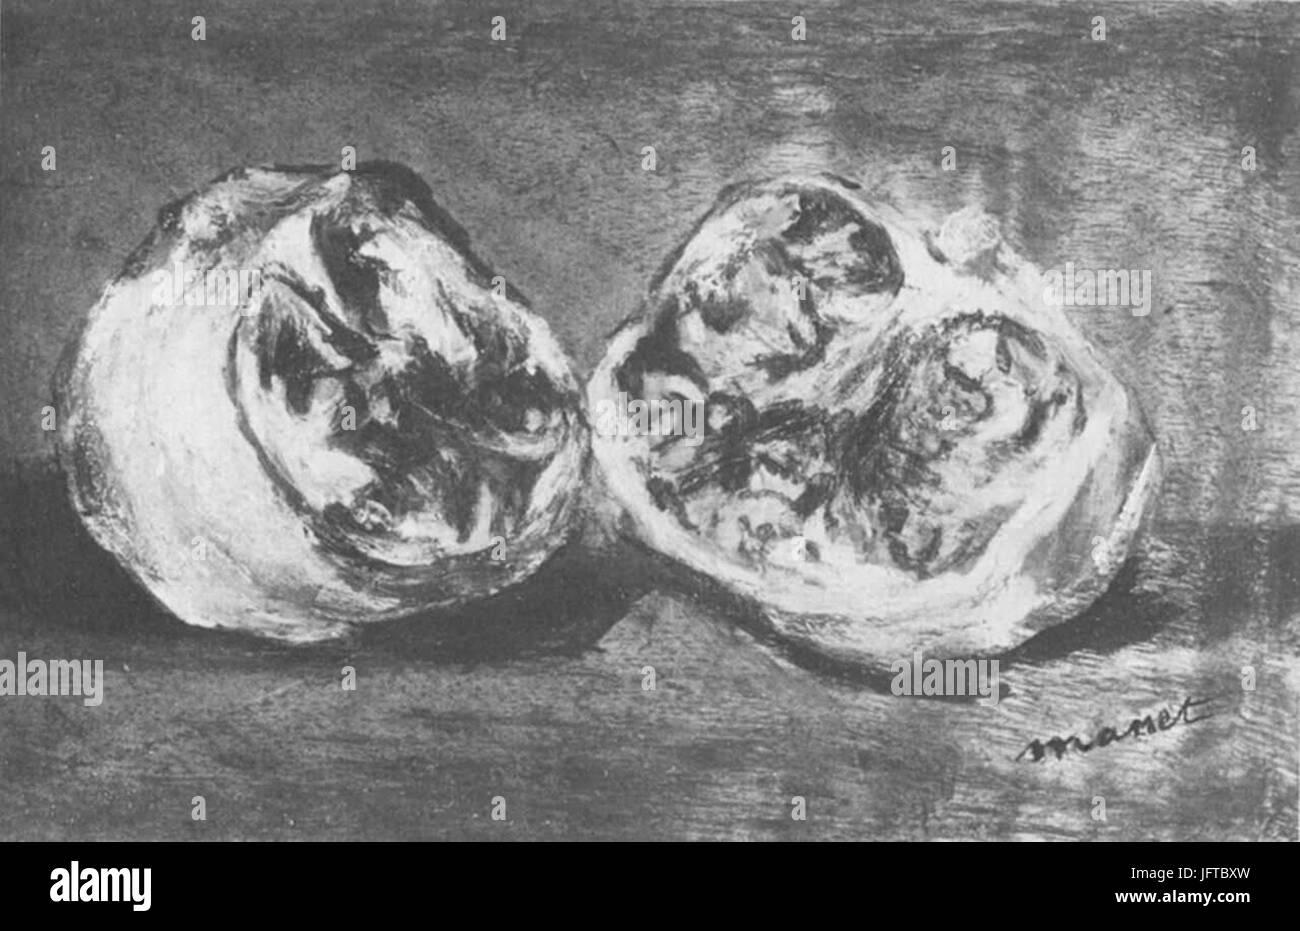 Édouard Manet - Grenade (RW 413) - Stock Image